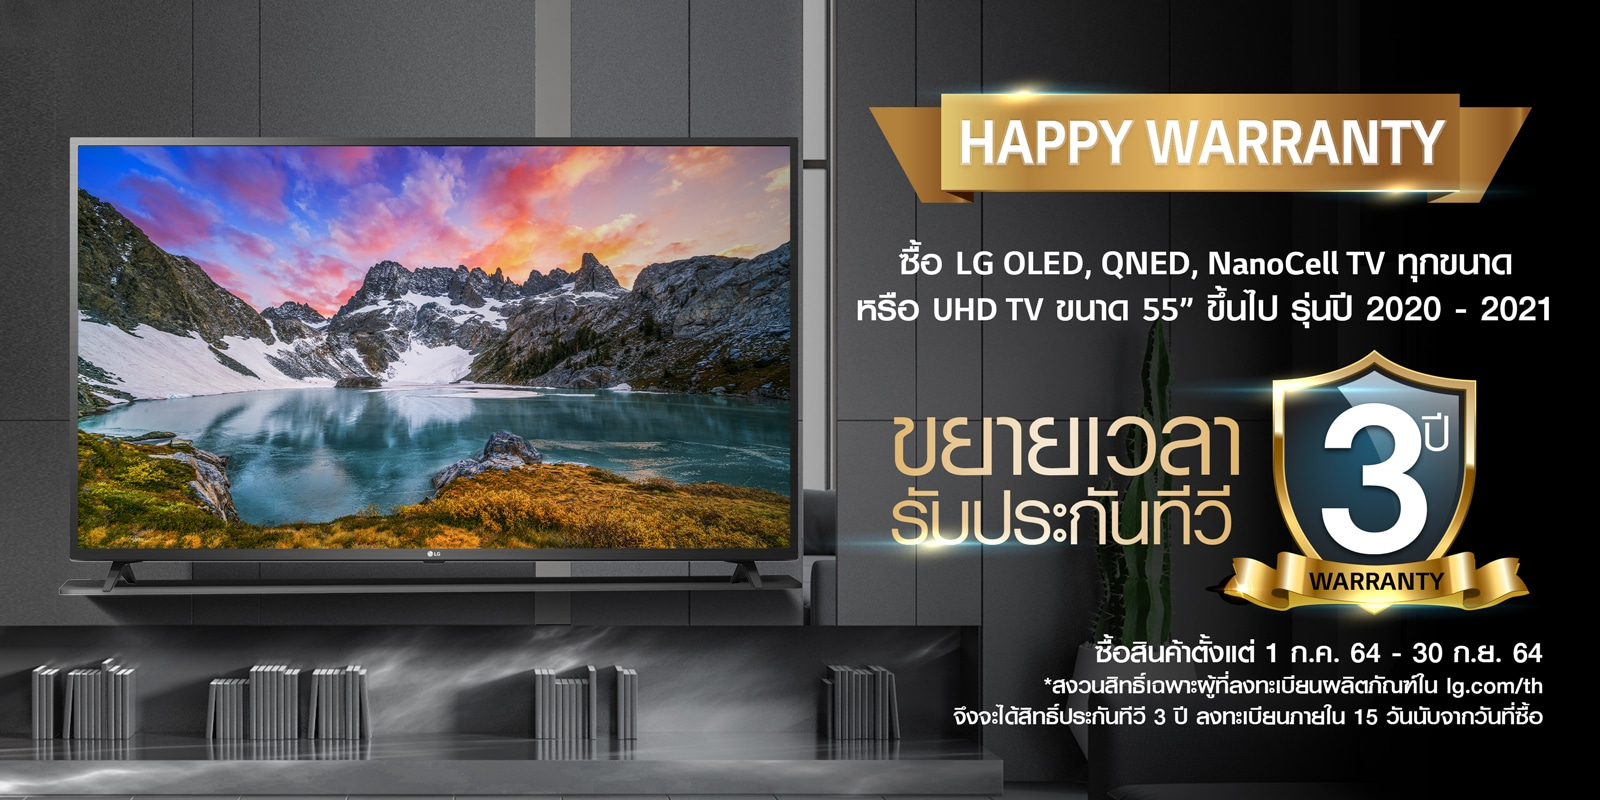 HE_3-Year_Warranty_1600x800_Th